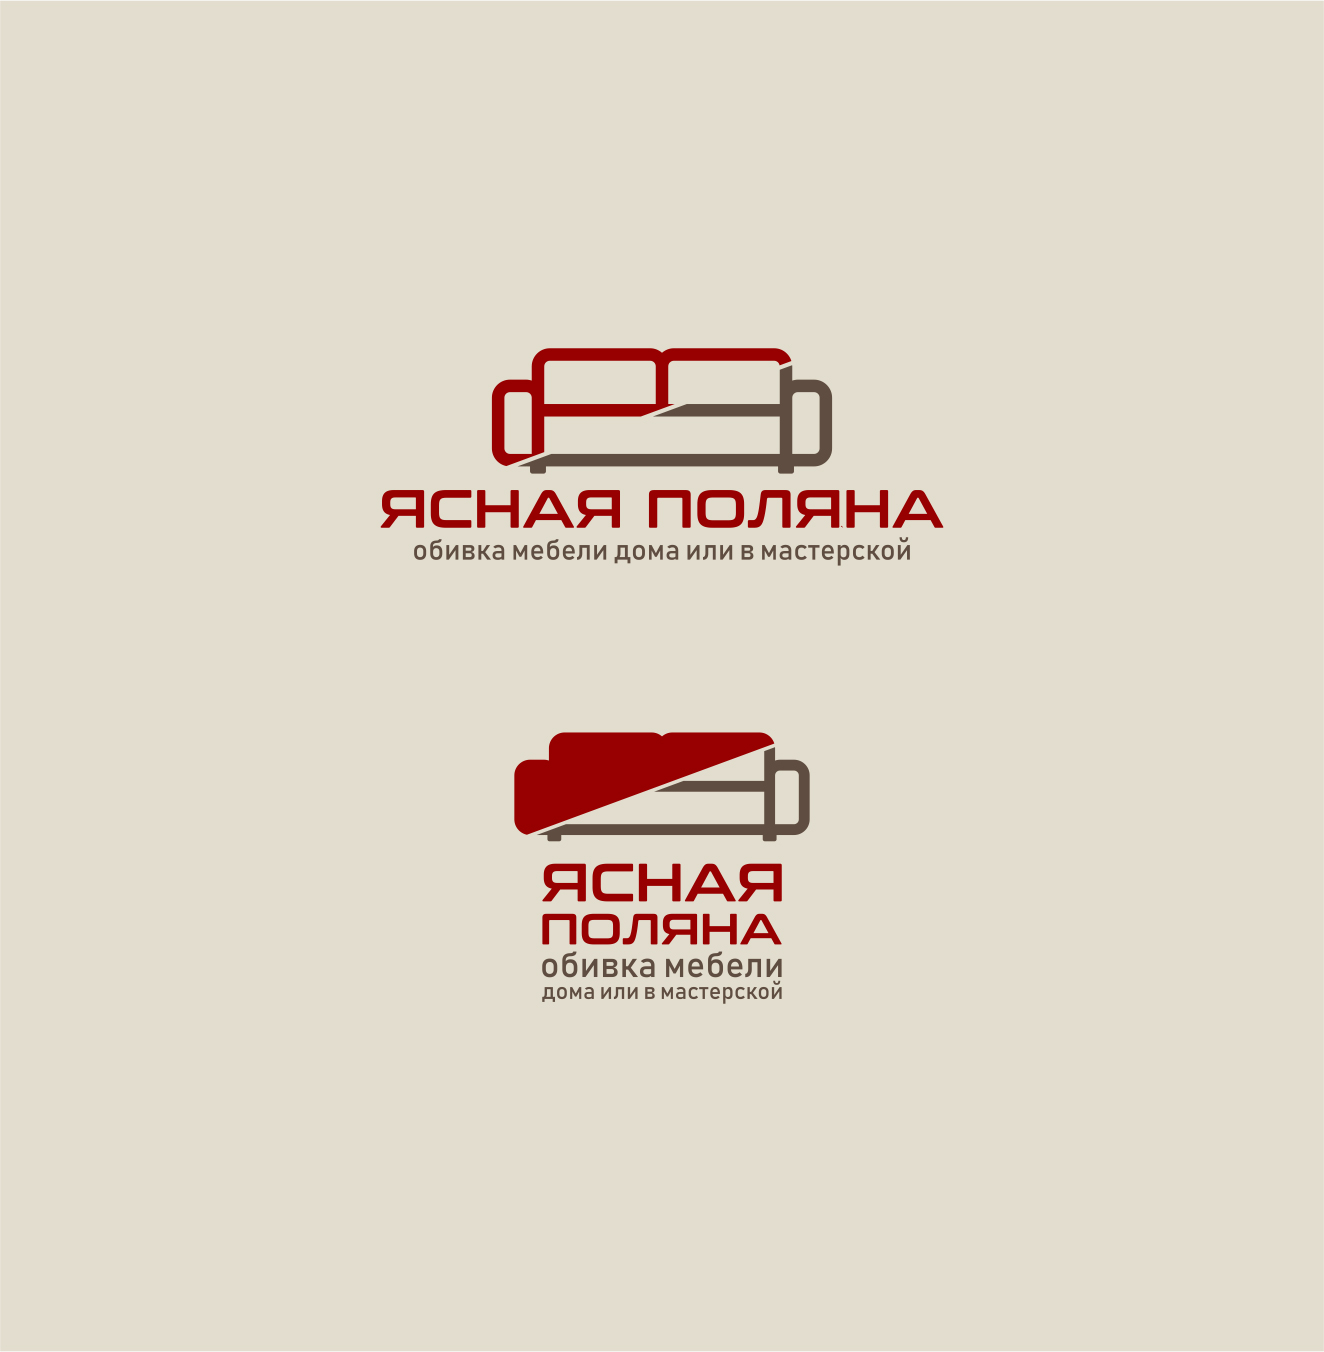 Логотип для сайта OBIVKA.RU фото f_8275c11018a15836.jpg